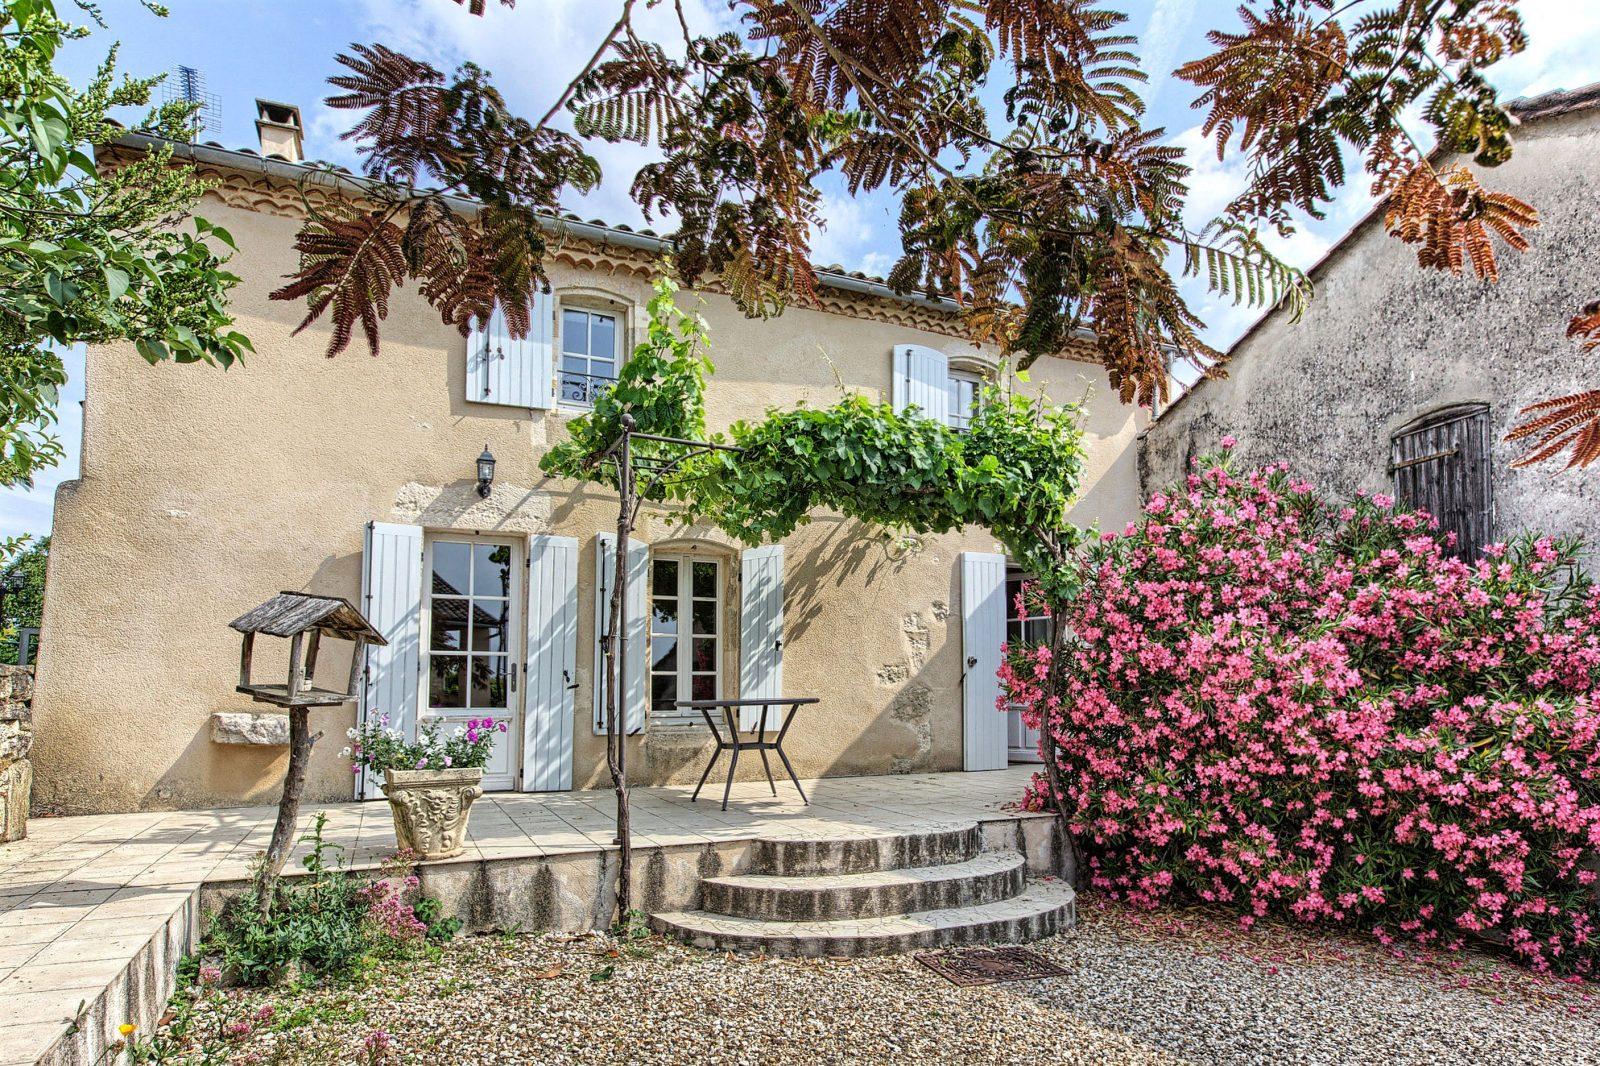 Saint-Seurin-de-Cursac – Mme MORVAN2